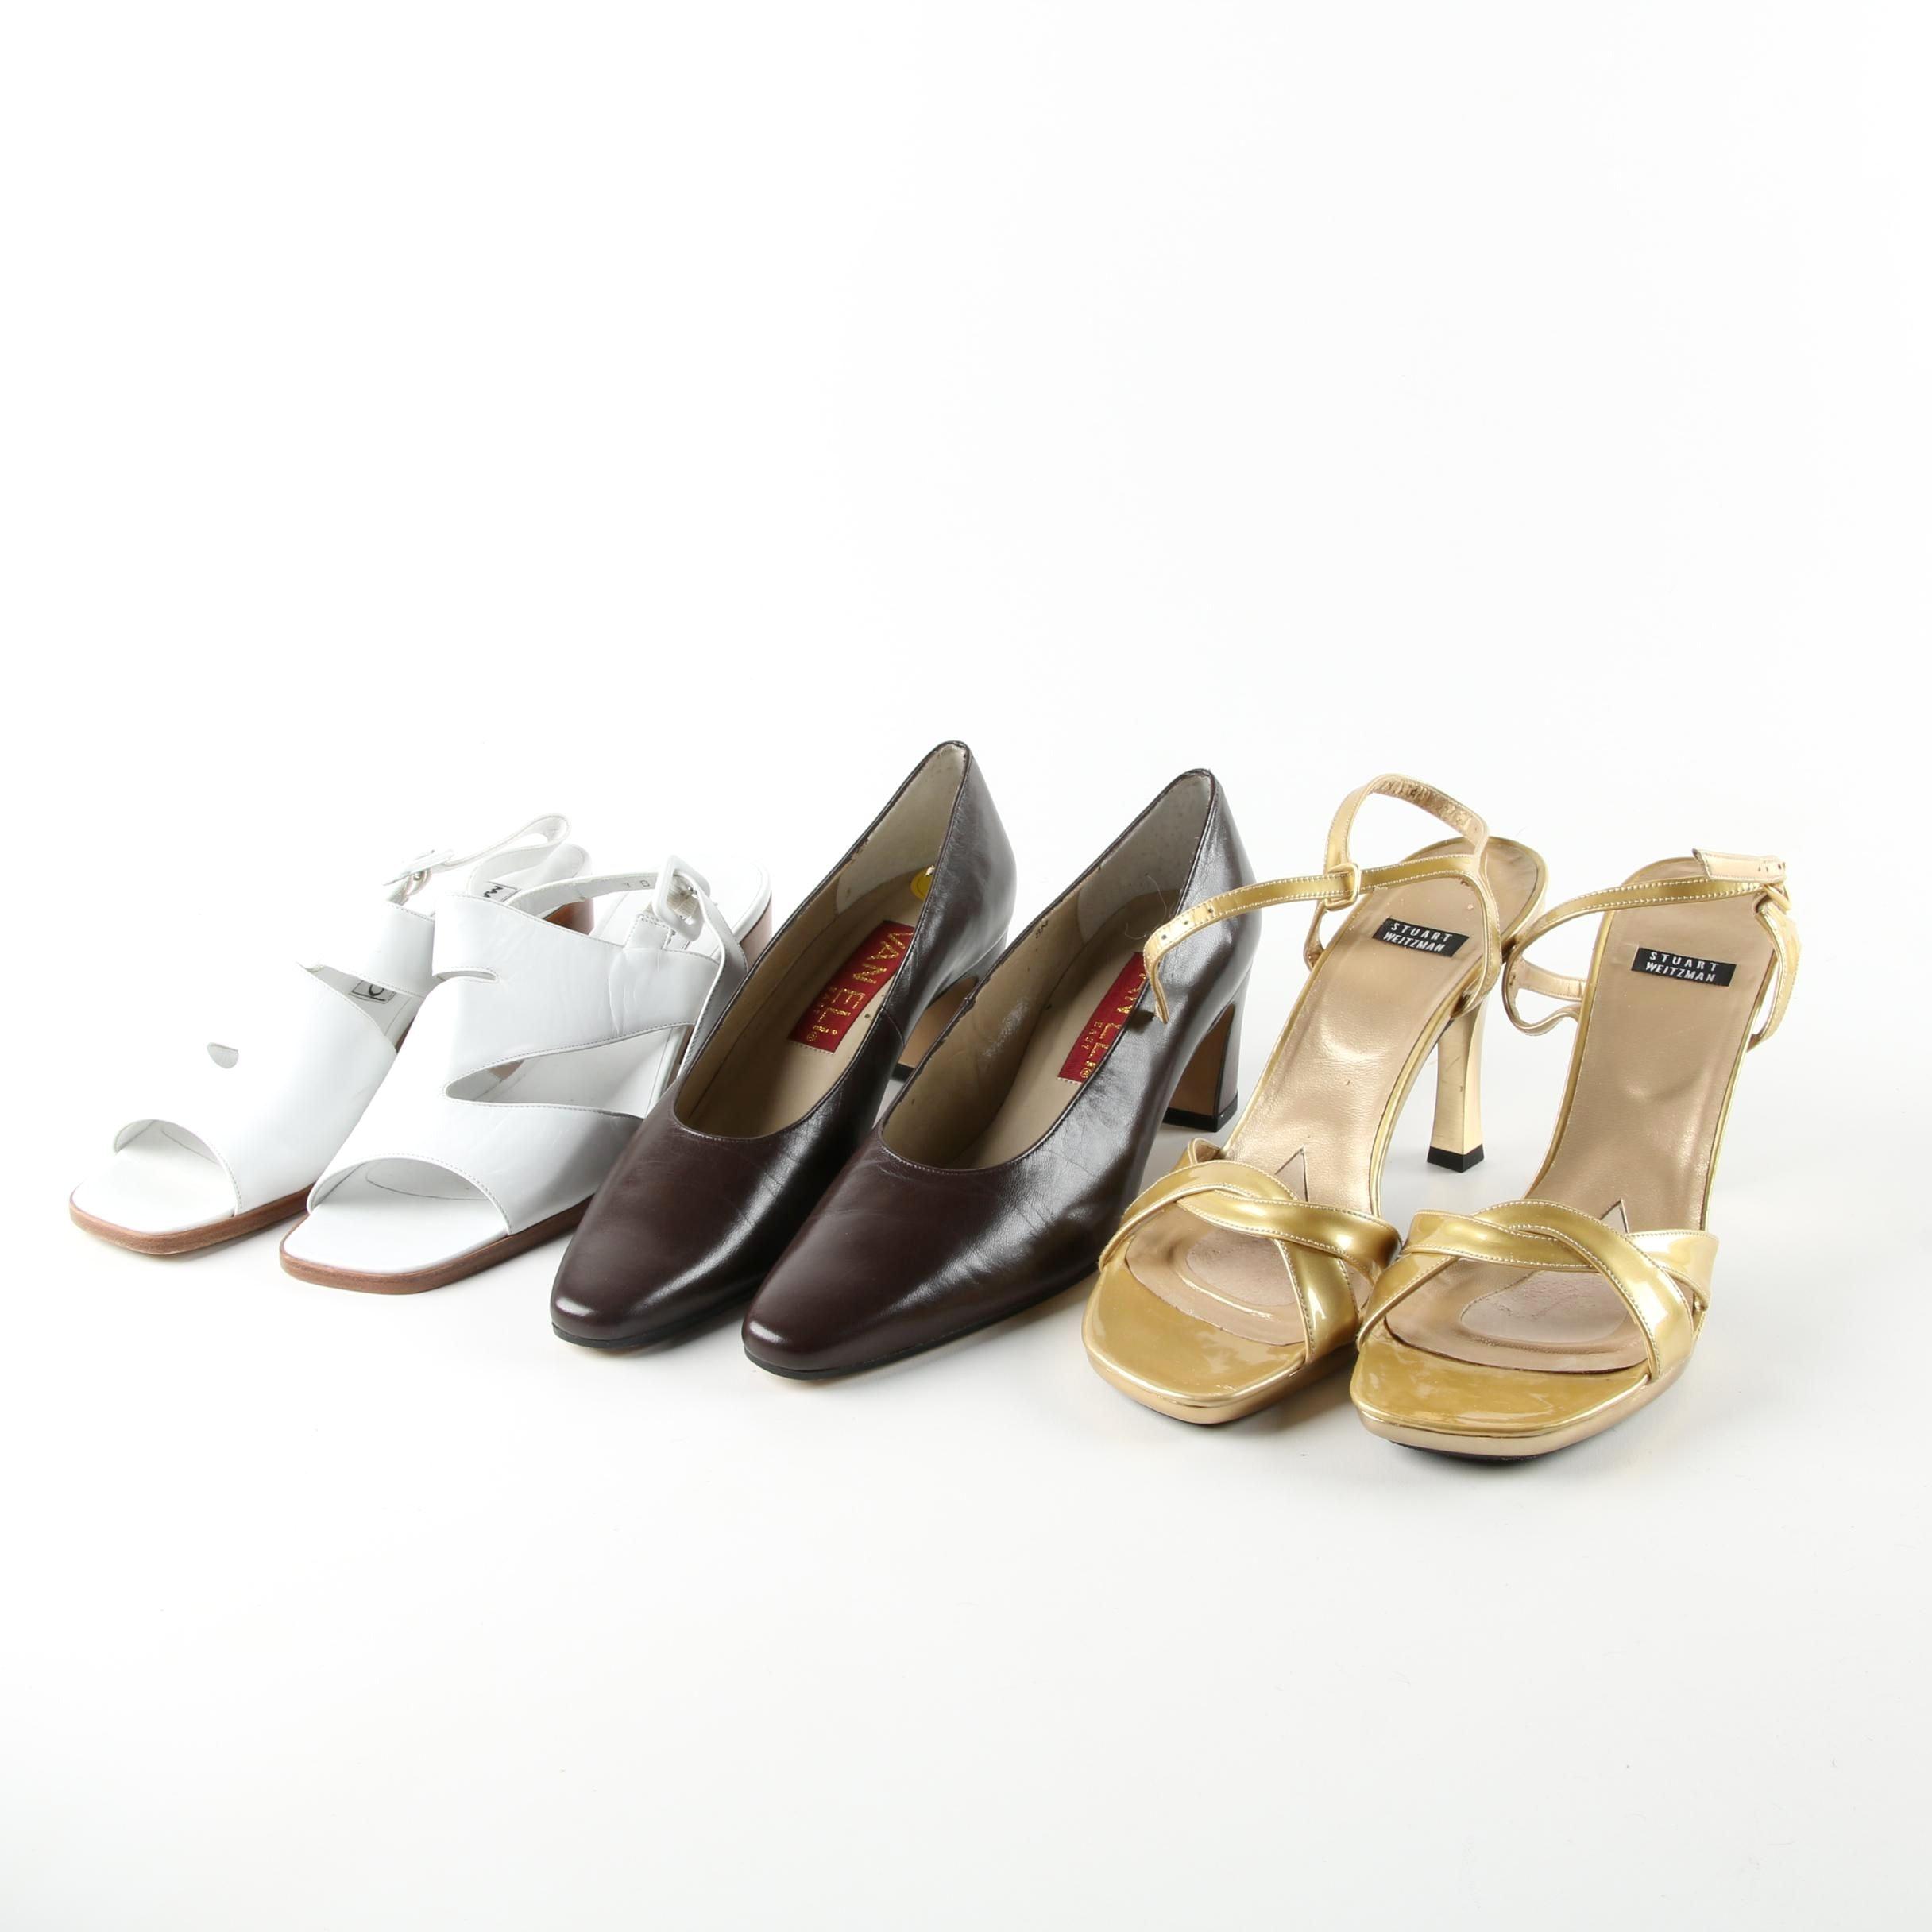 Stuart Weitzman, Martini Osvaldo, Van Eli Heels and Sandals